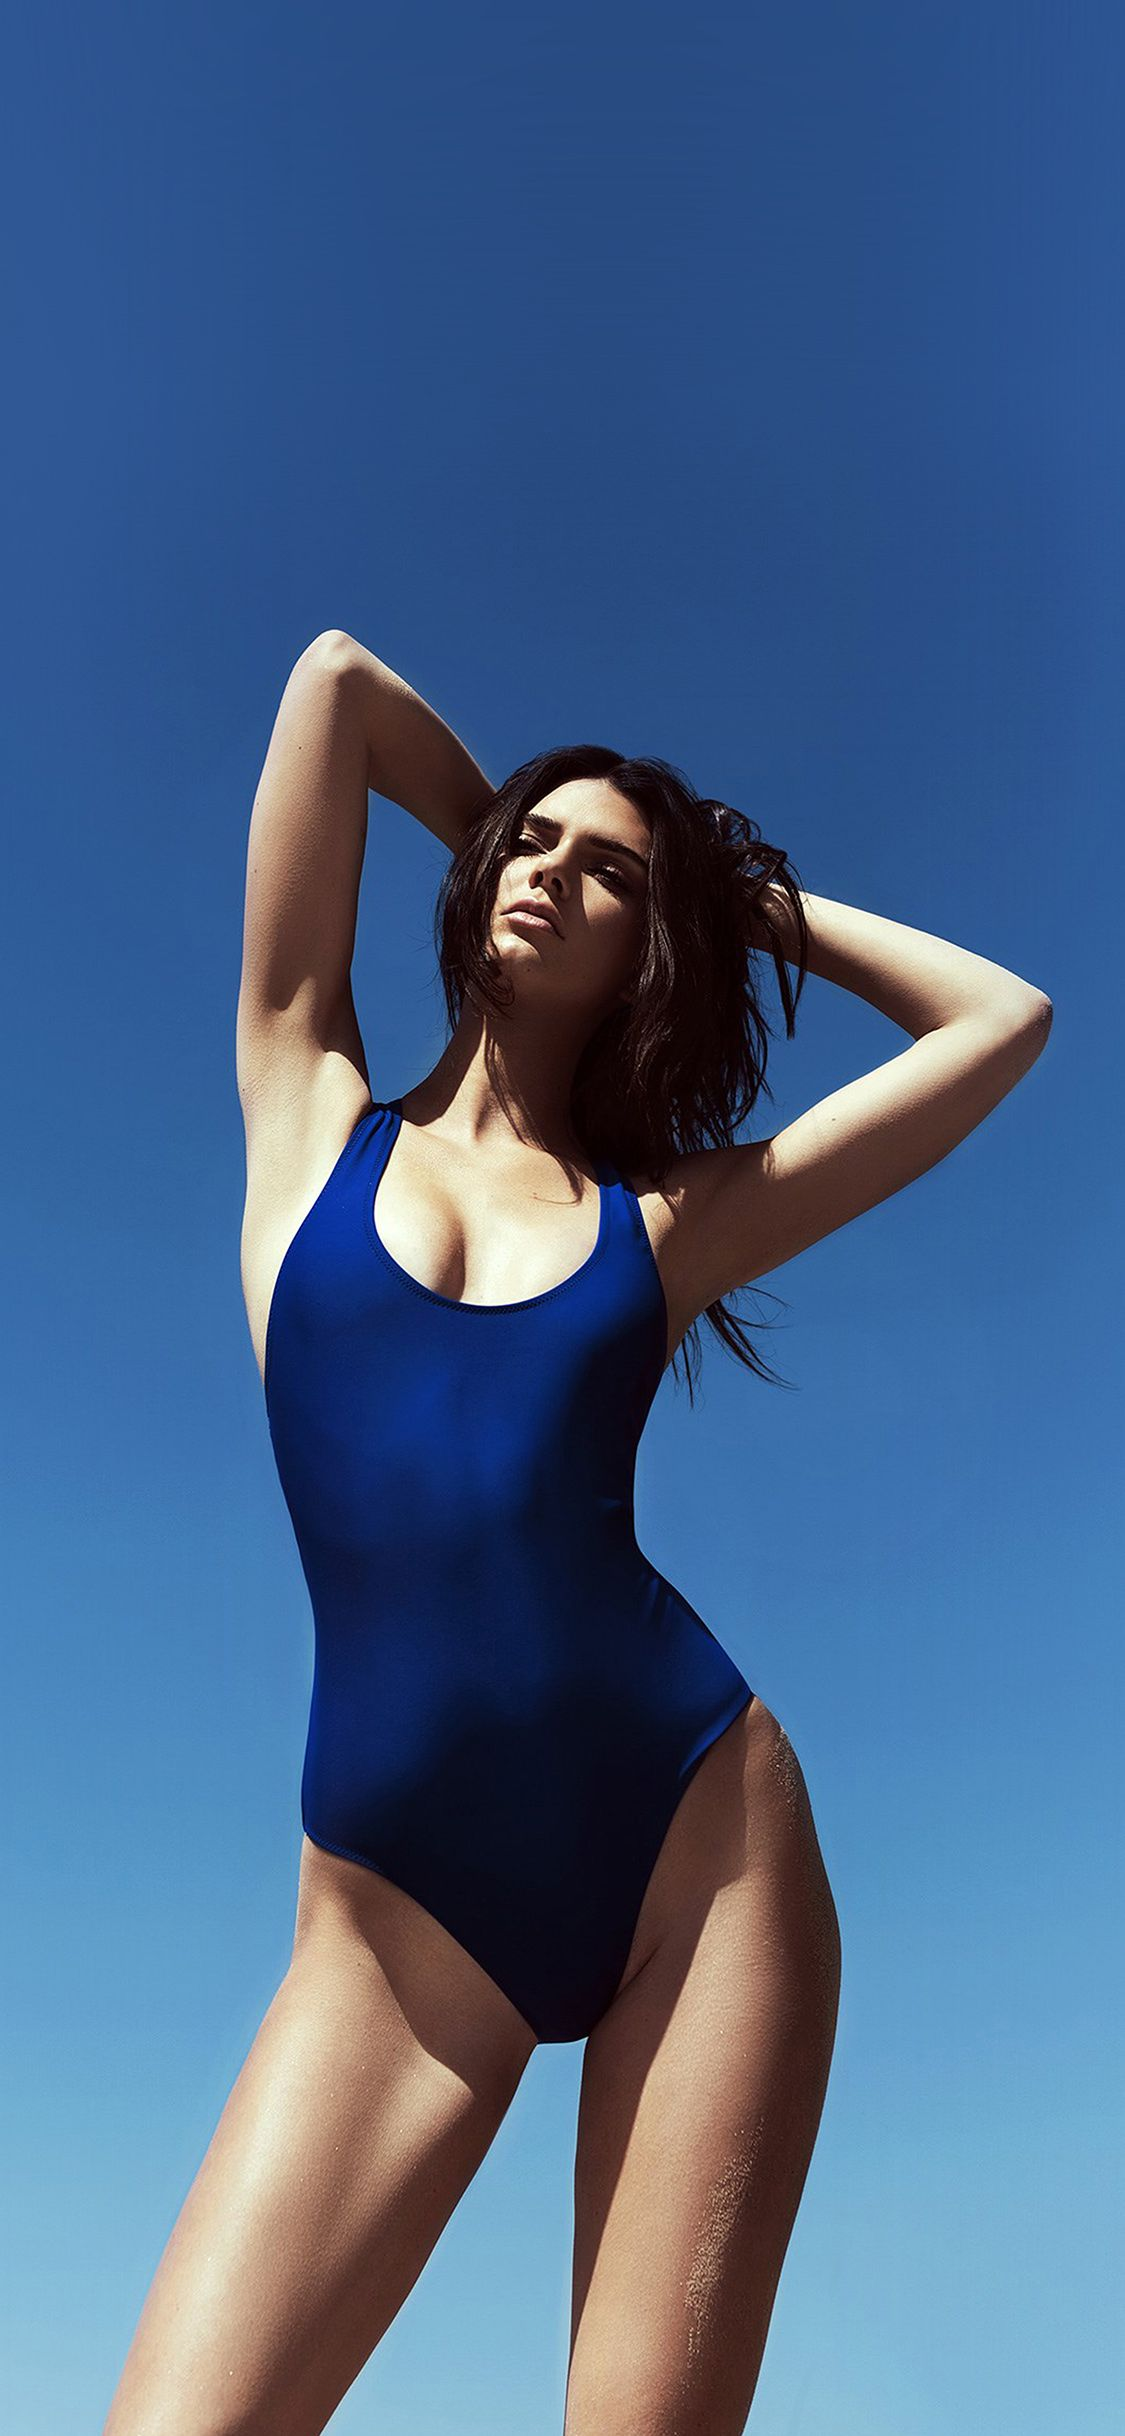 3ee56cc79c8d iPhoneXpapers.com-Apple-iPhone-wallpaper-hj59-kendall-jenner -blue-bikini-summer-cool-sexy